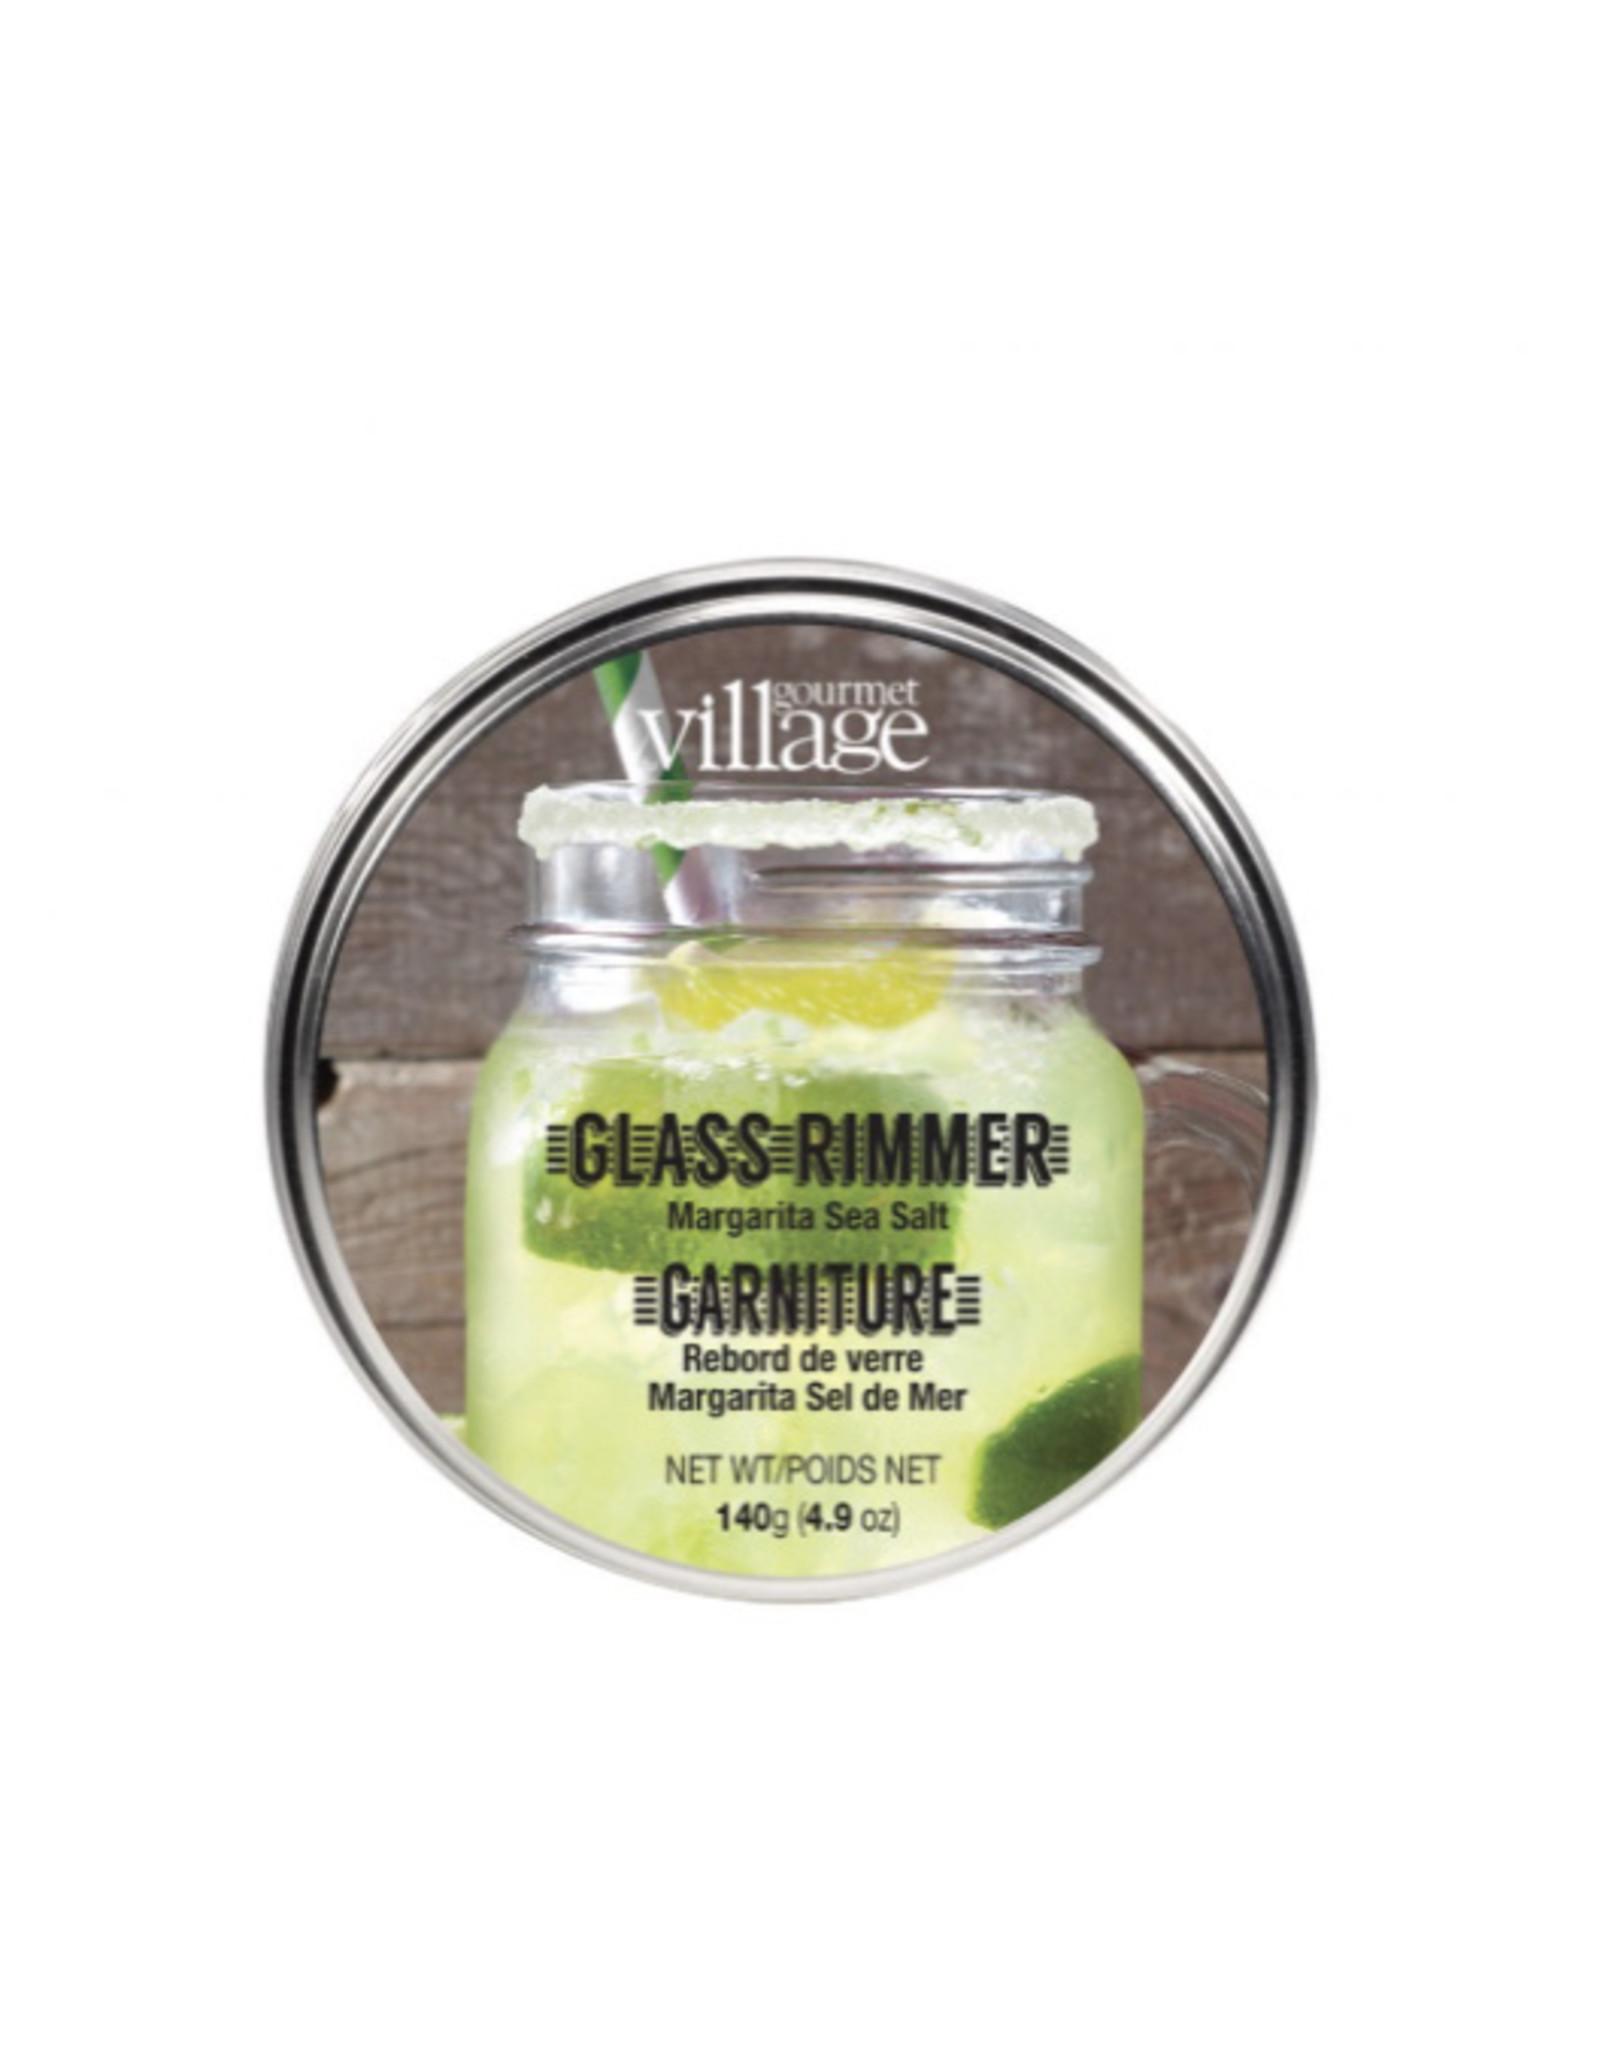 Gourmet du Village Margarita Sea Salt With Lime, Glass Rimmer